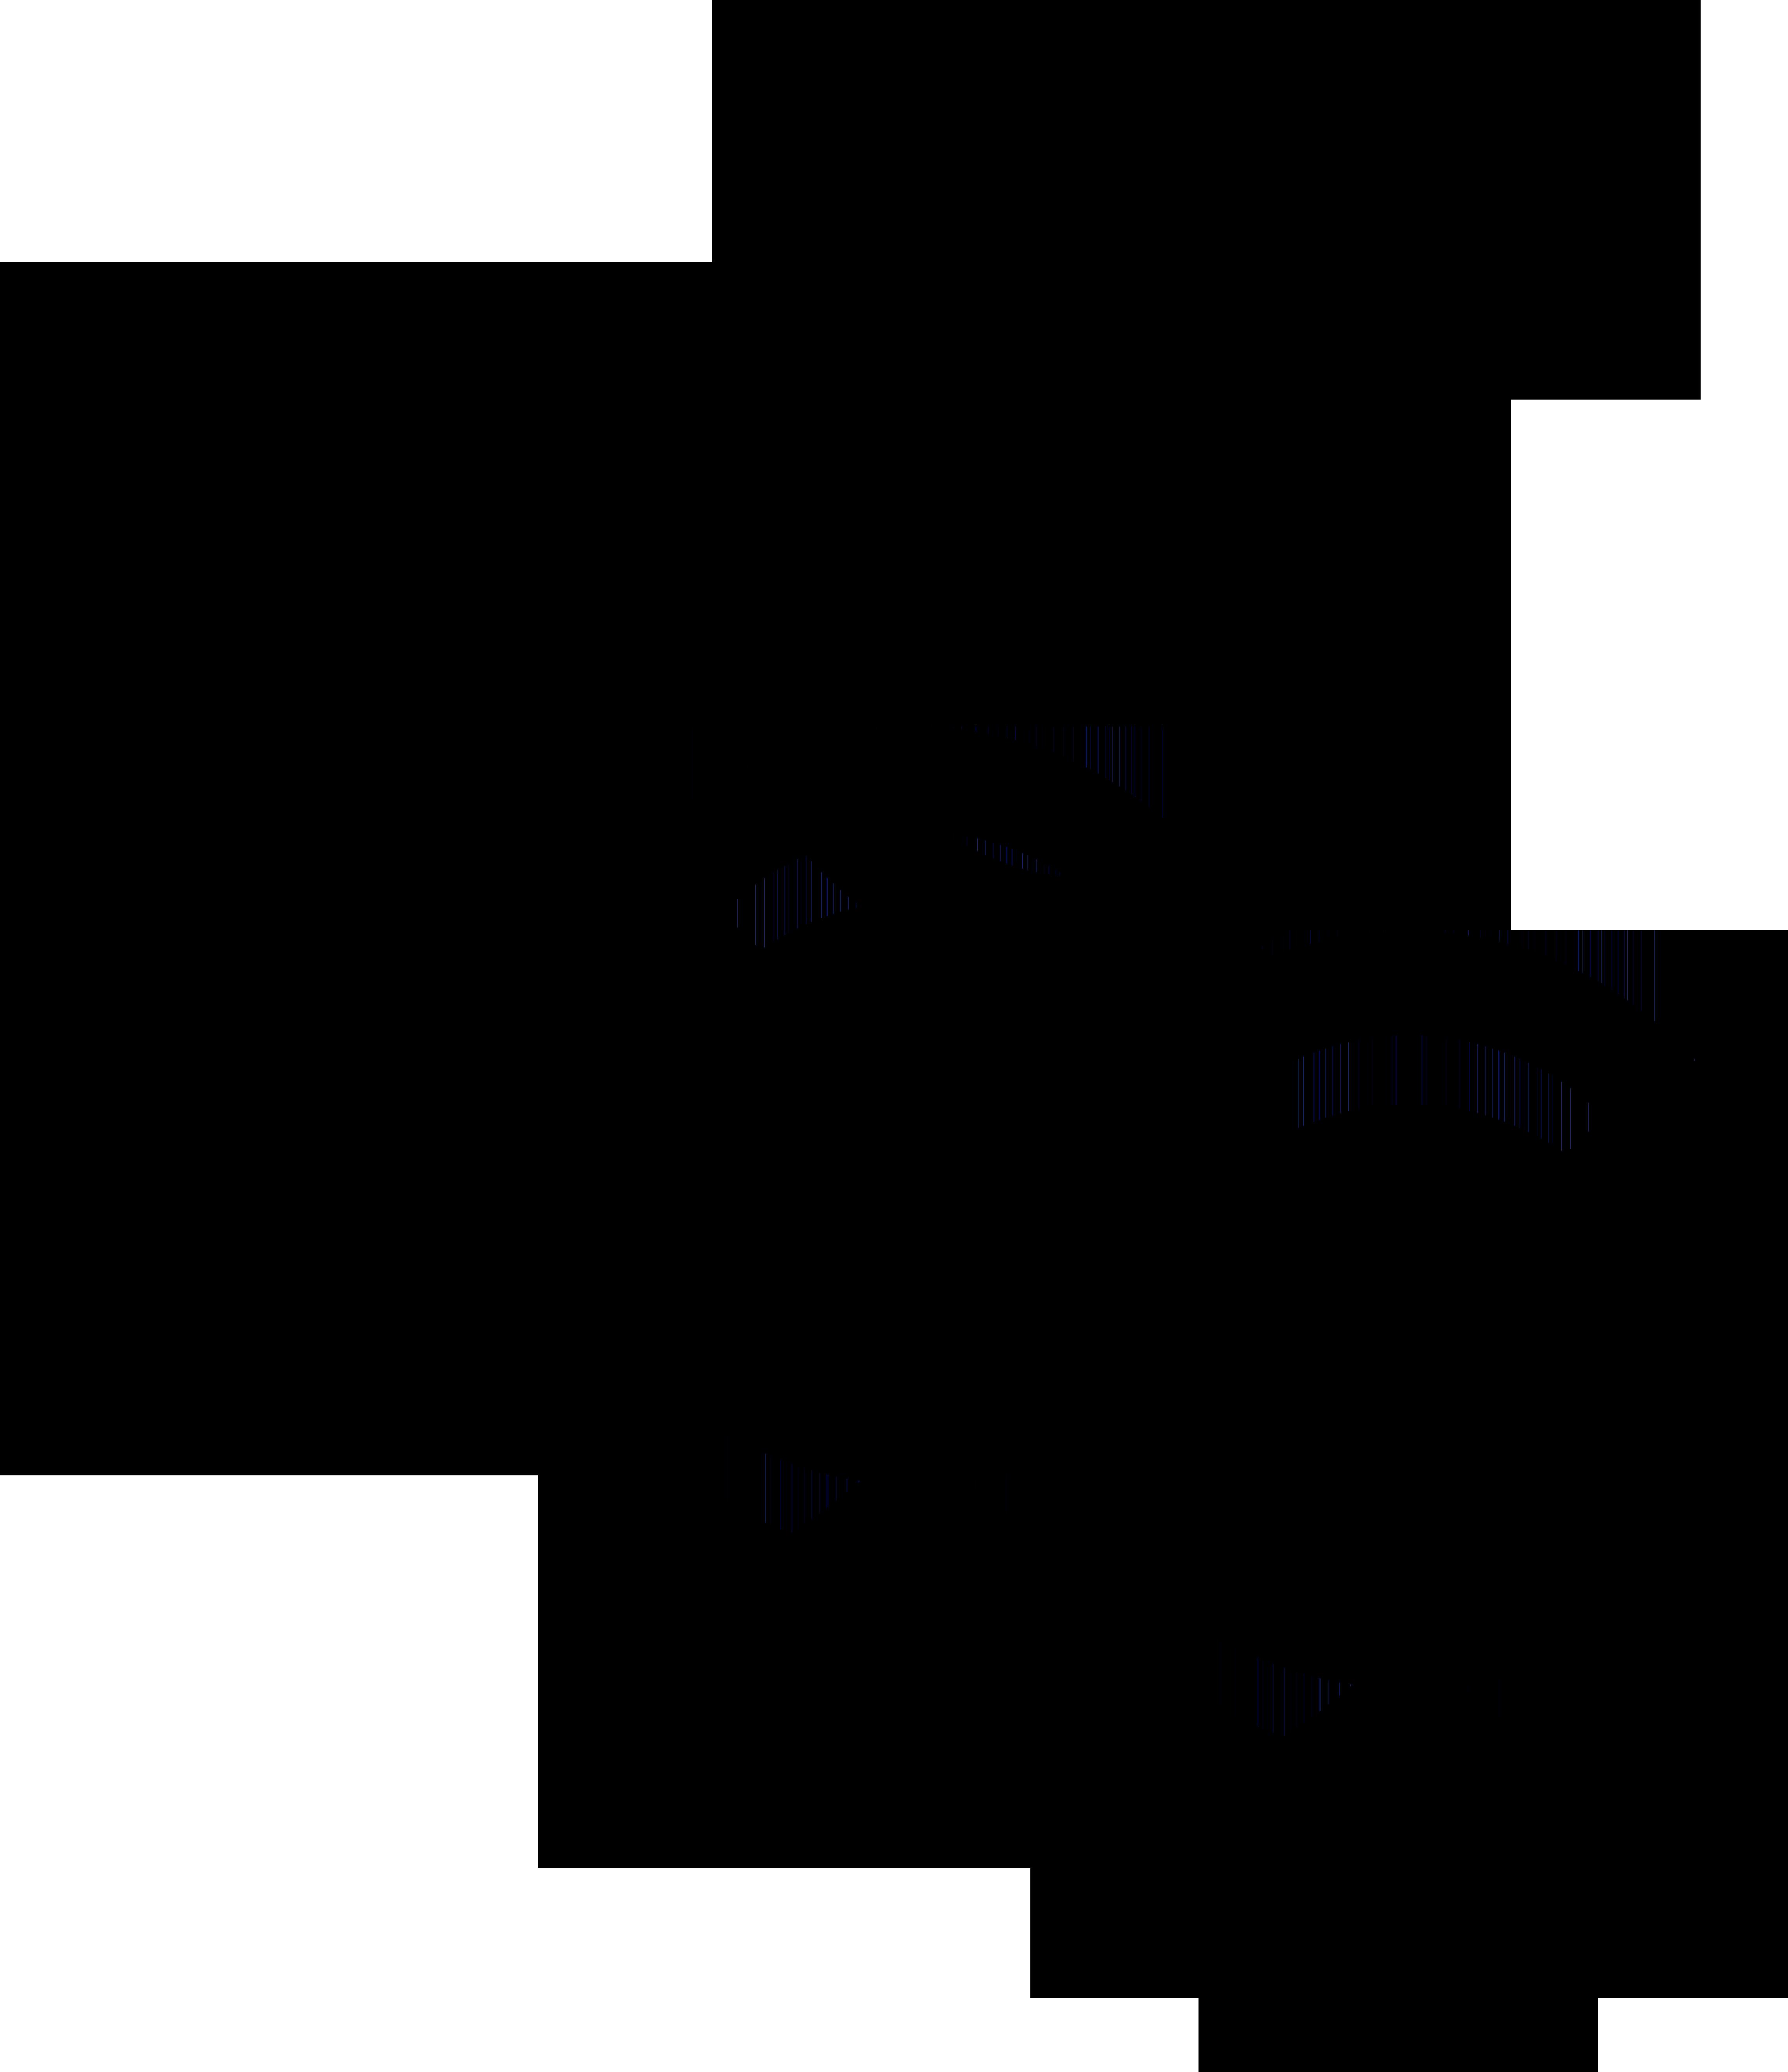 Venus symbol interlocked with nonbinary, Mars and Venus symbols.